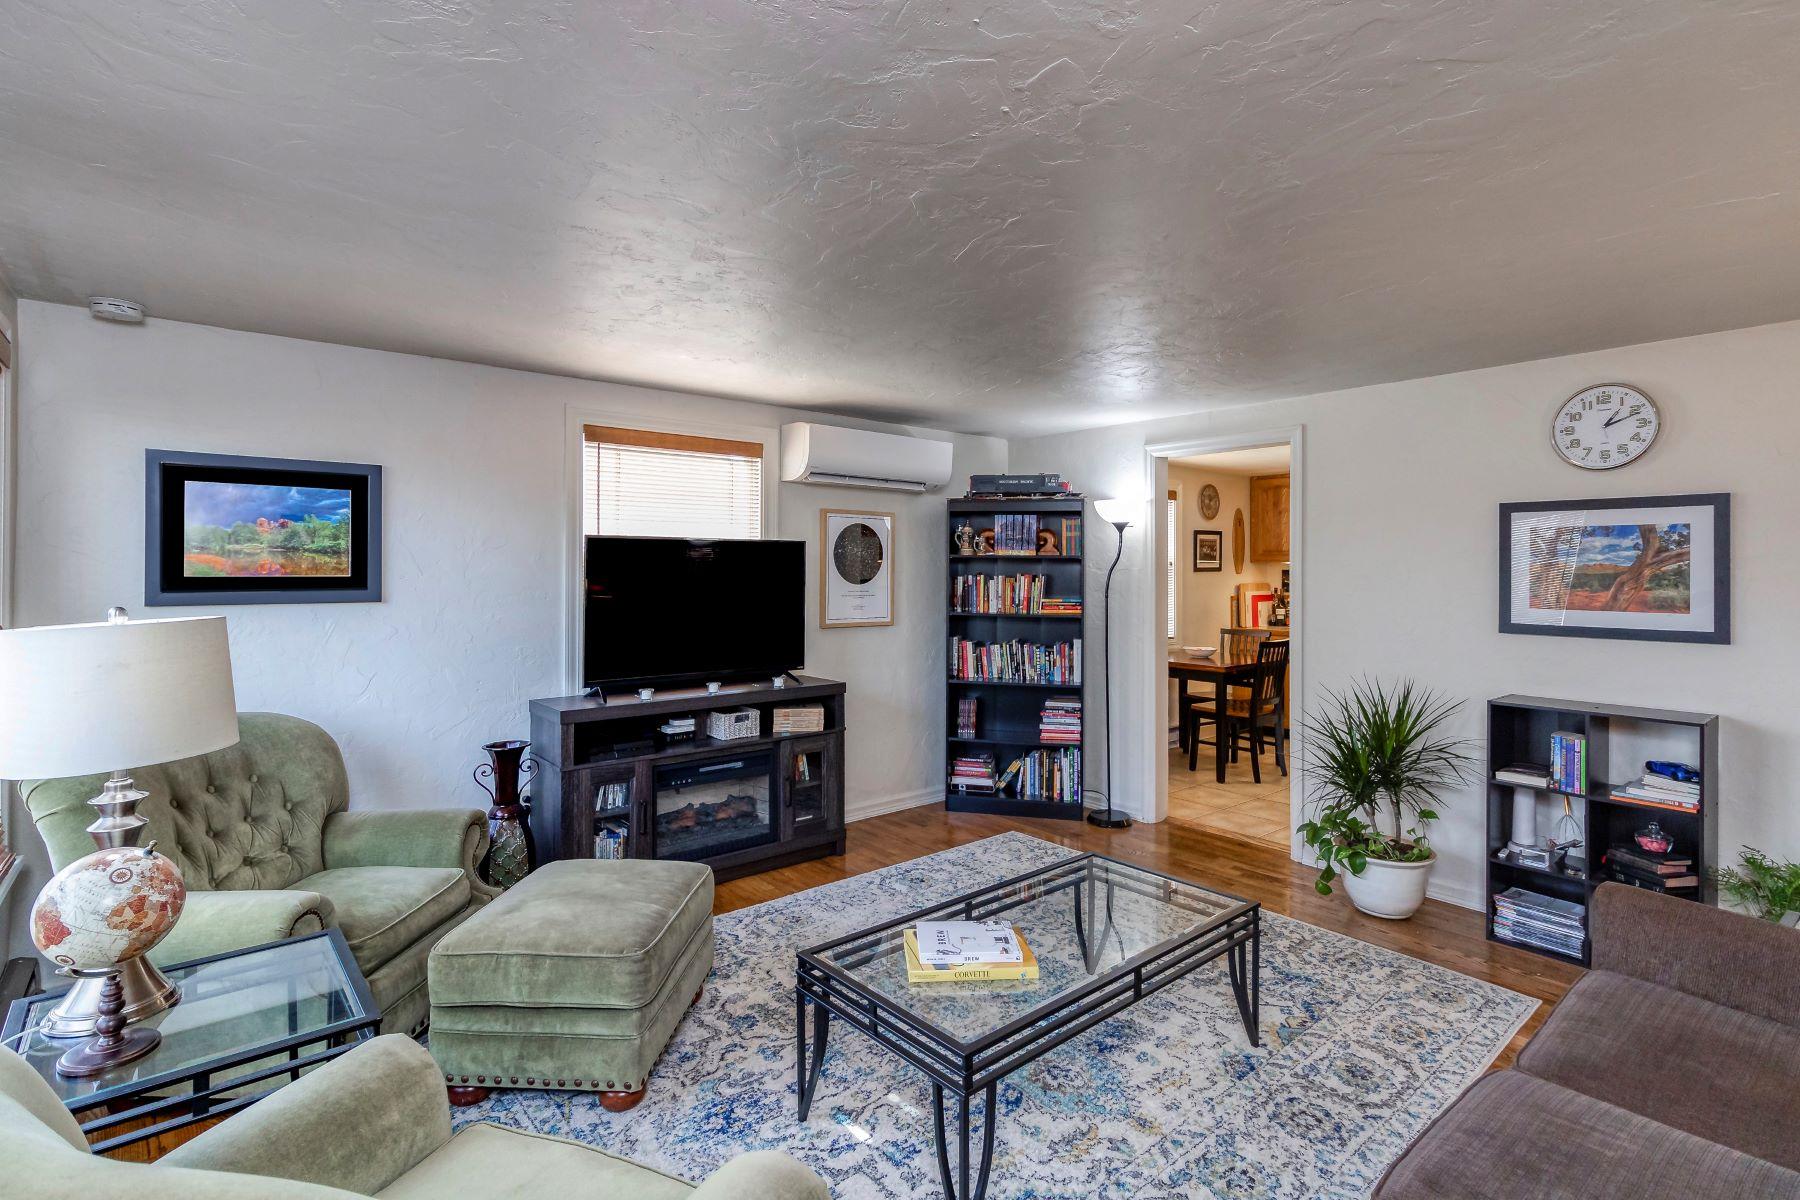 Single Family Homes for Sale at Whimsical and discreet cottage 1052 St. John Street Walla Walla, Washington 99362 United States